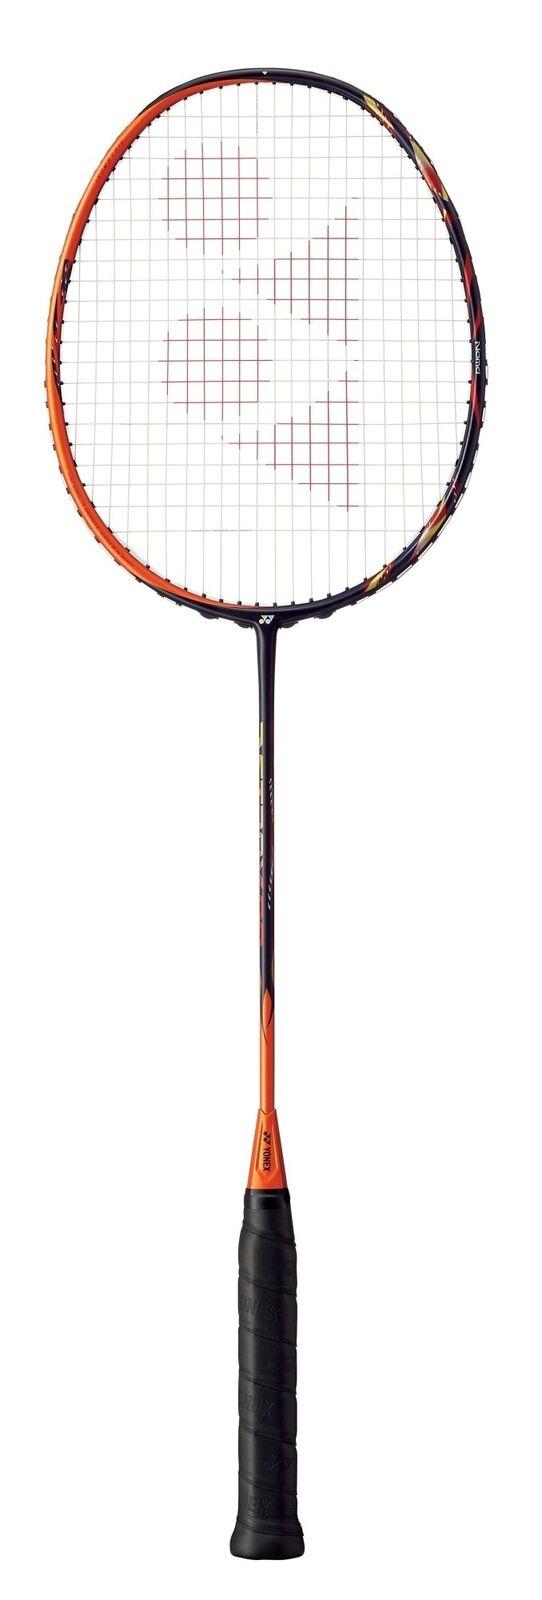 Yonex Astrox 99 Racchetta Badminton Racchetta da Badminton Racchetta